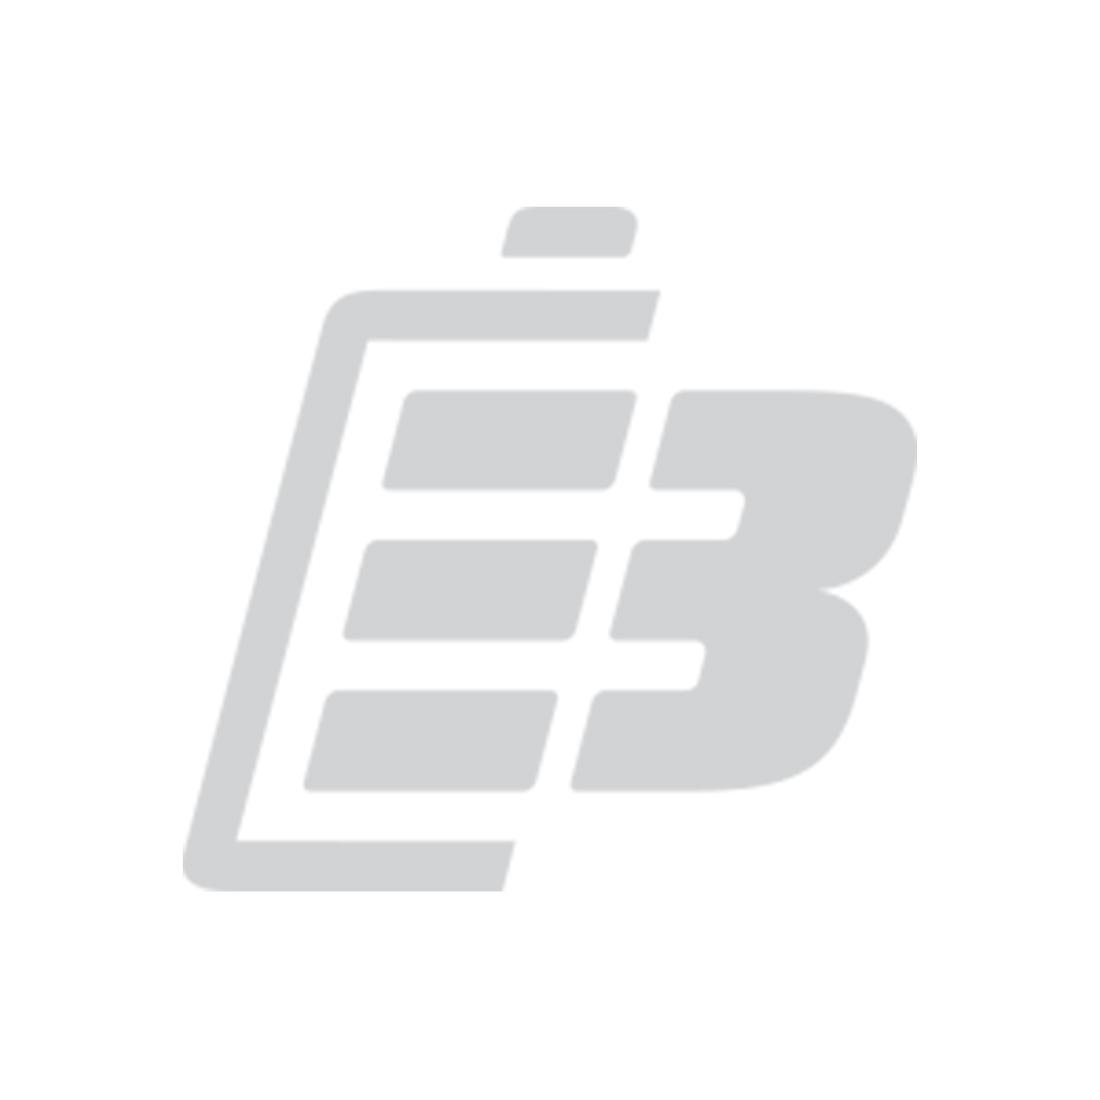 Mobile phone battery Nokia 5220 XpressMusic_1